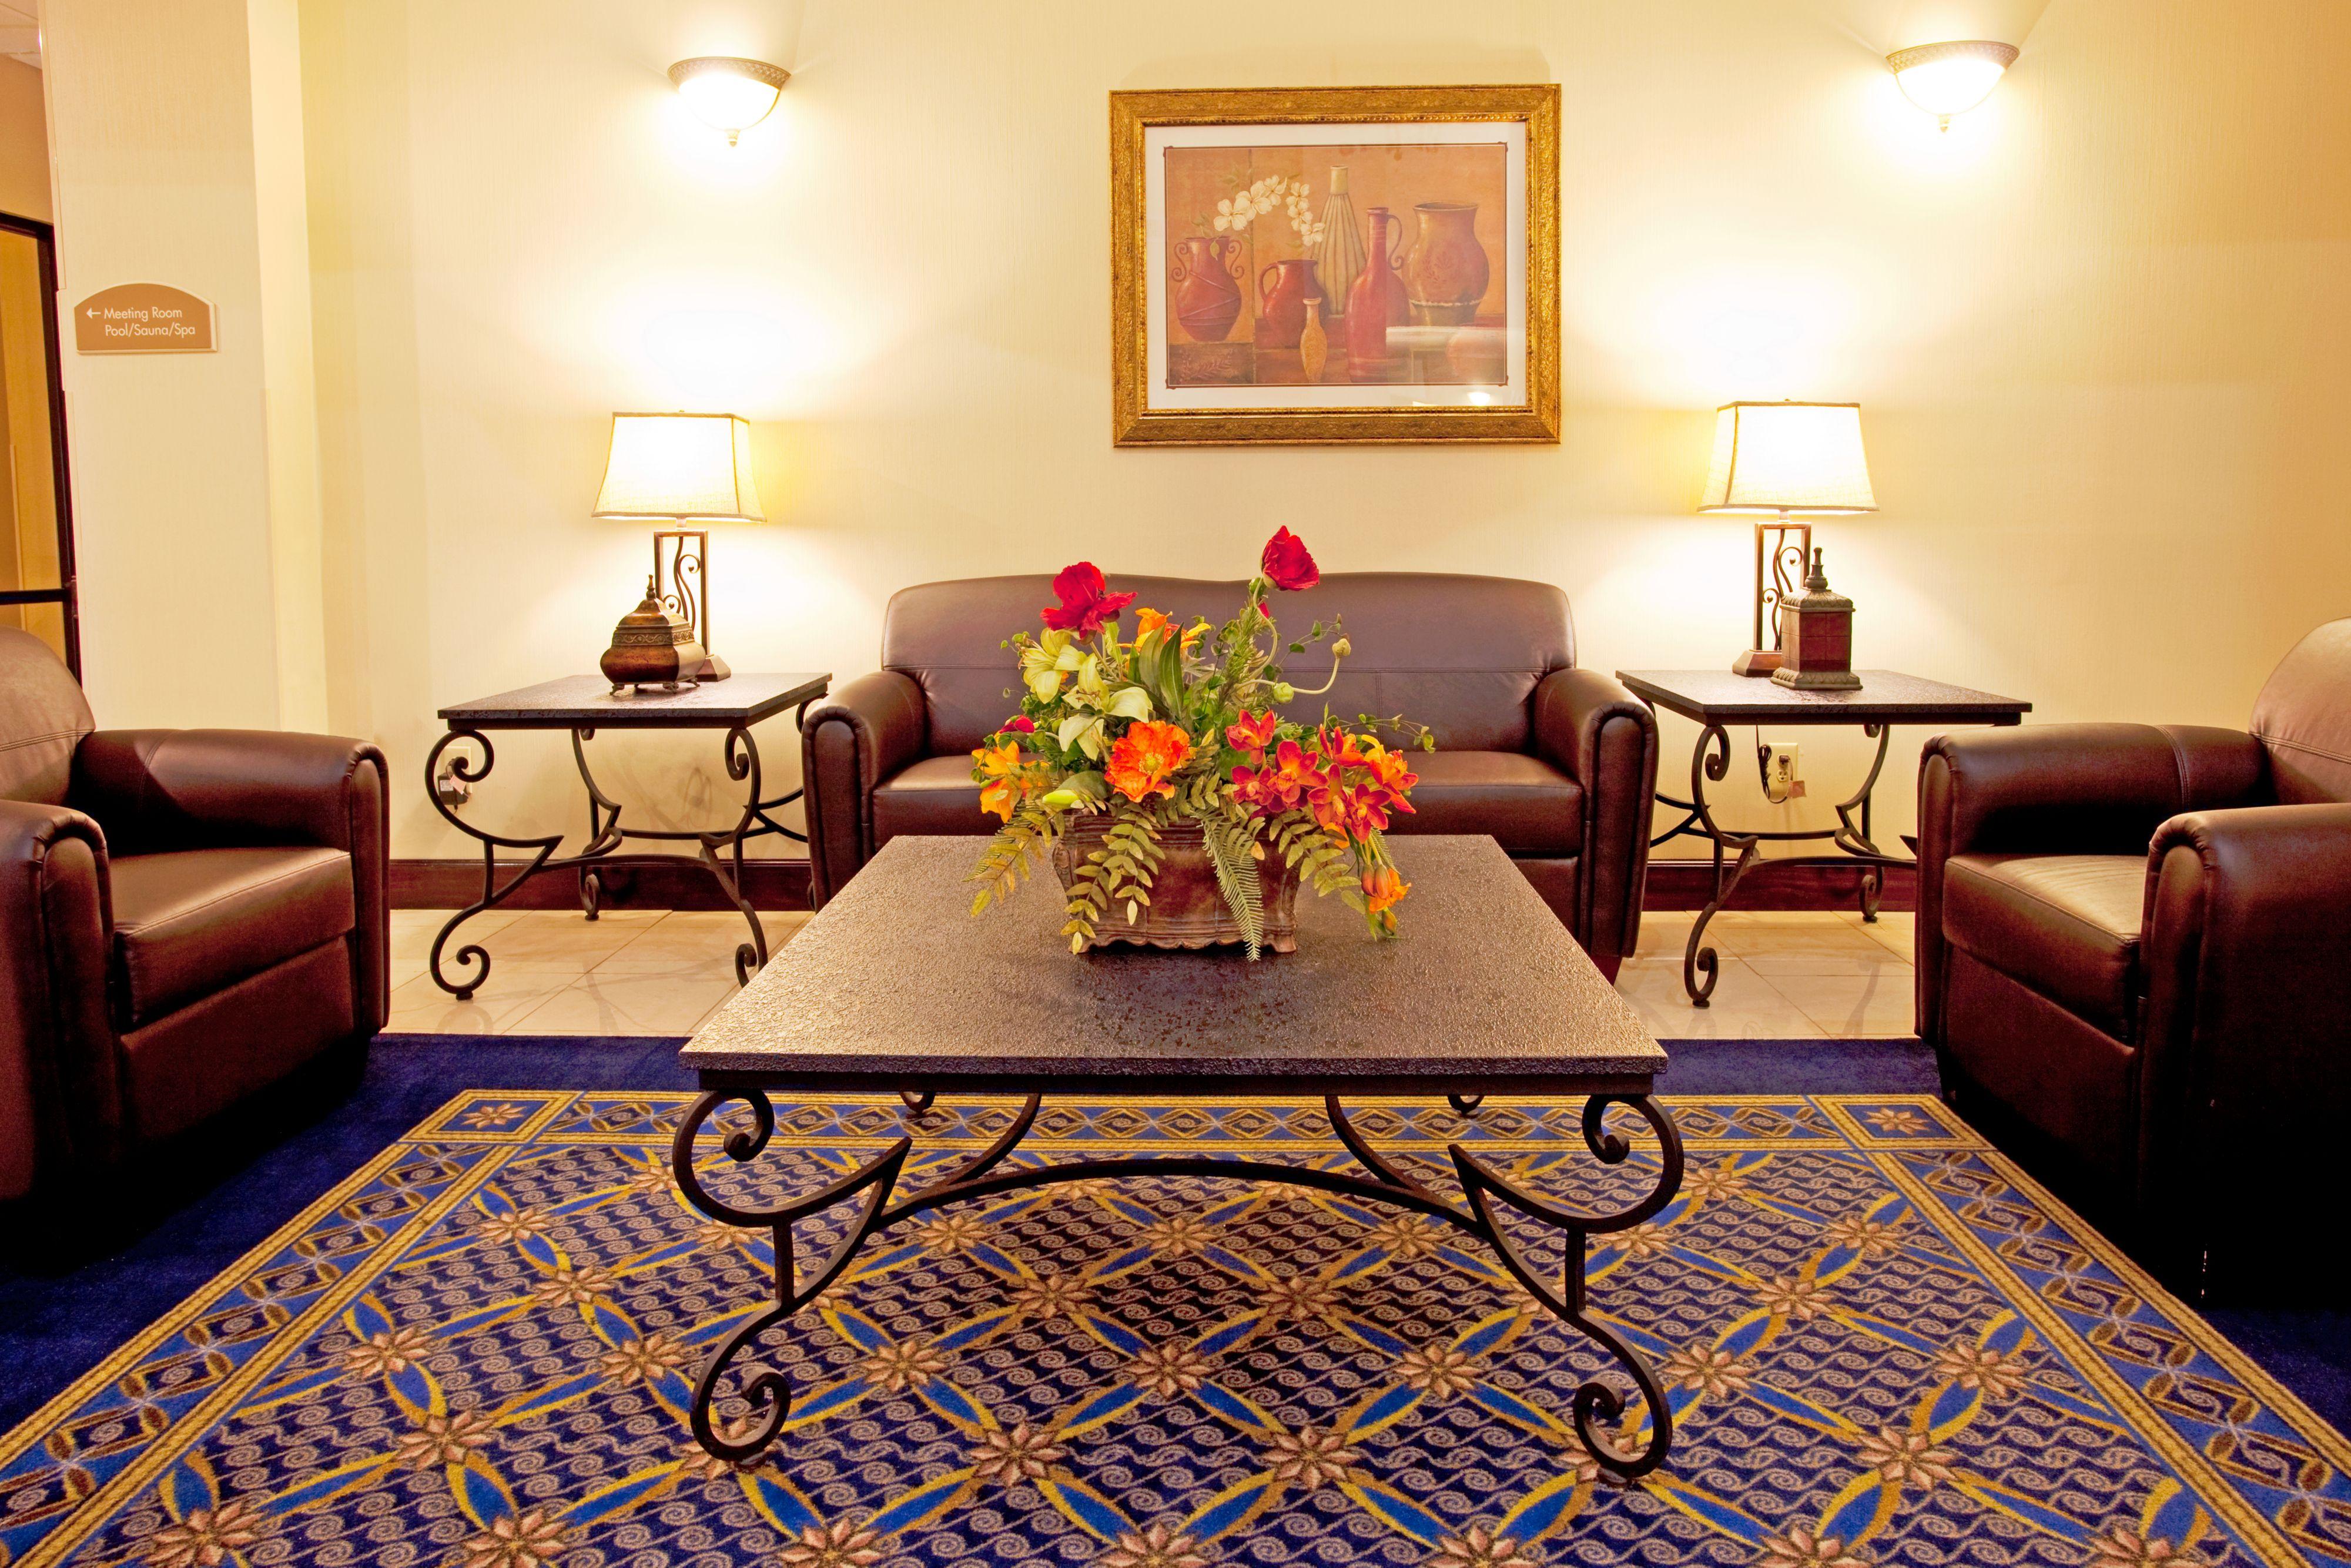 Holiday Inn Express & Suites Douglas image 4